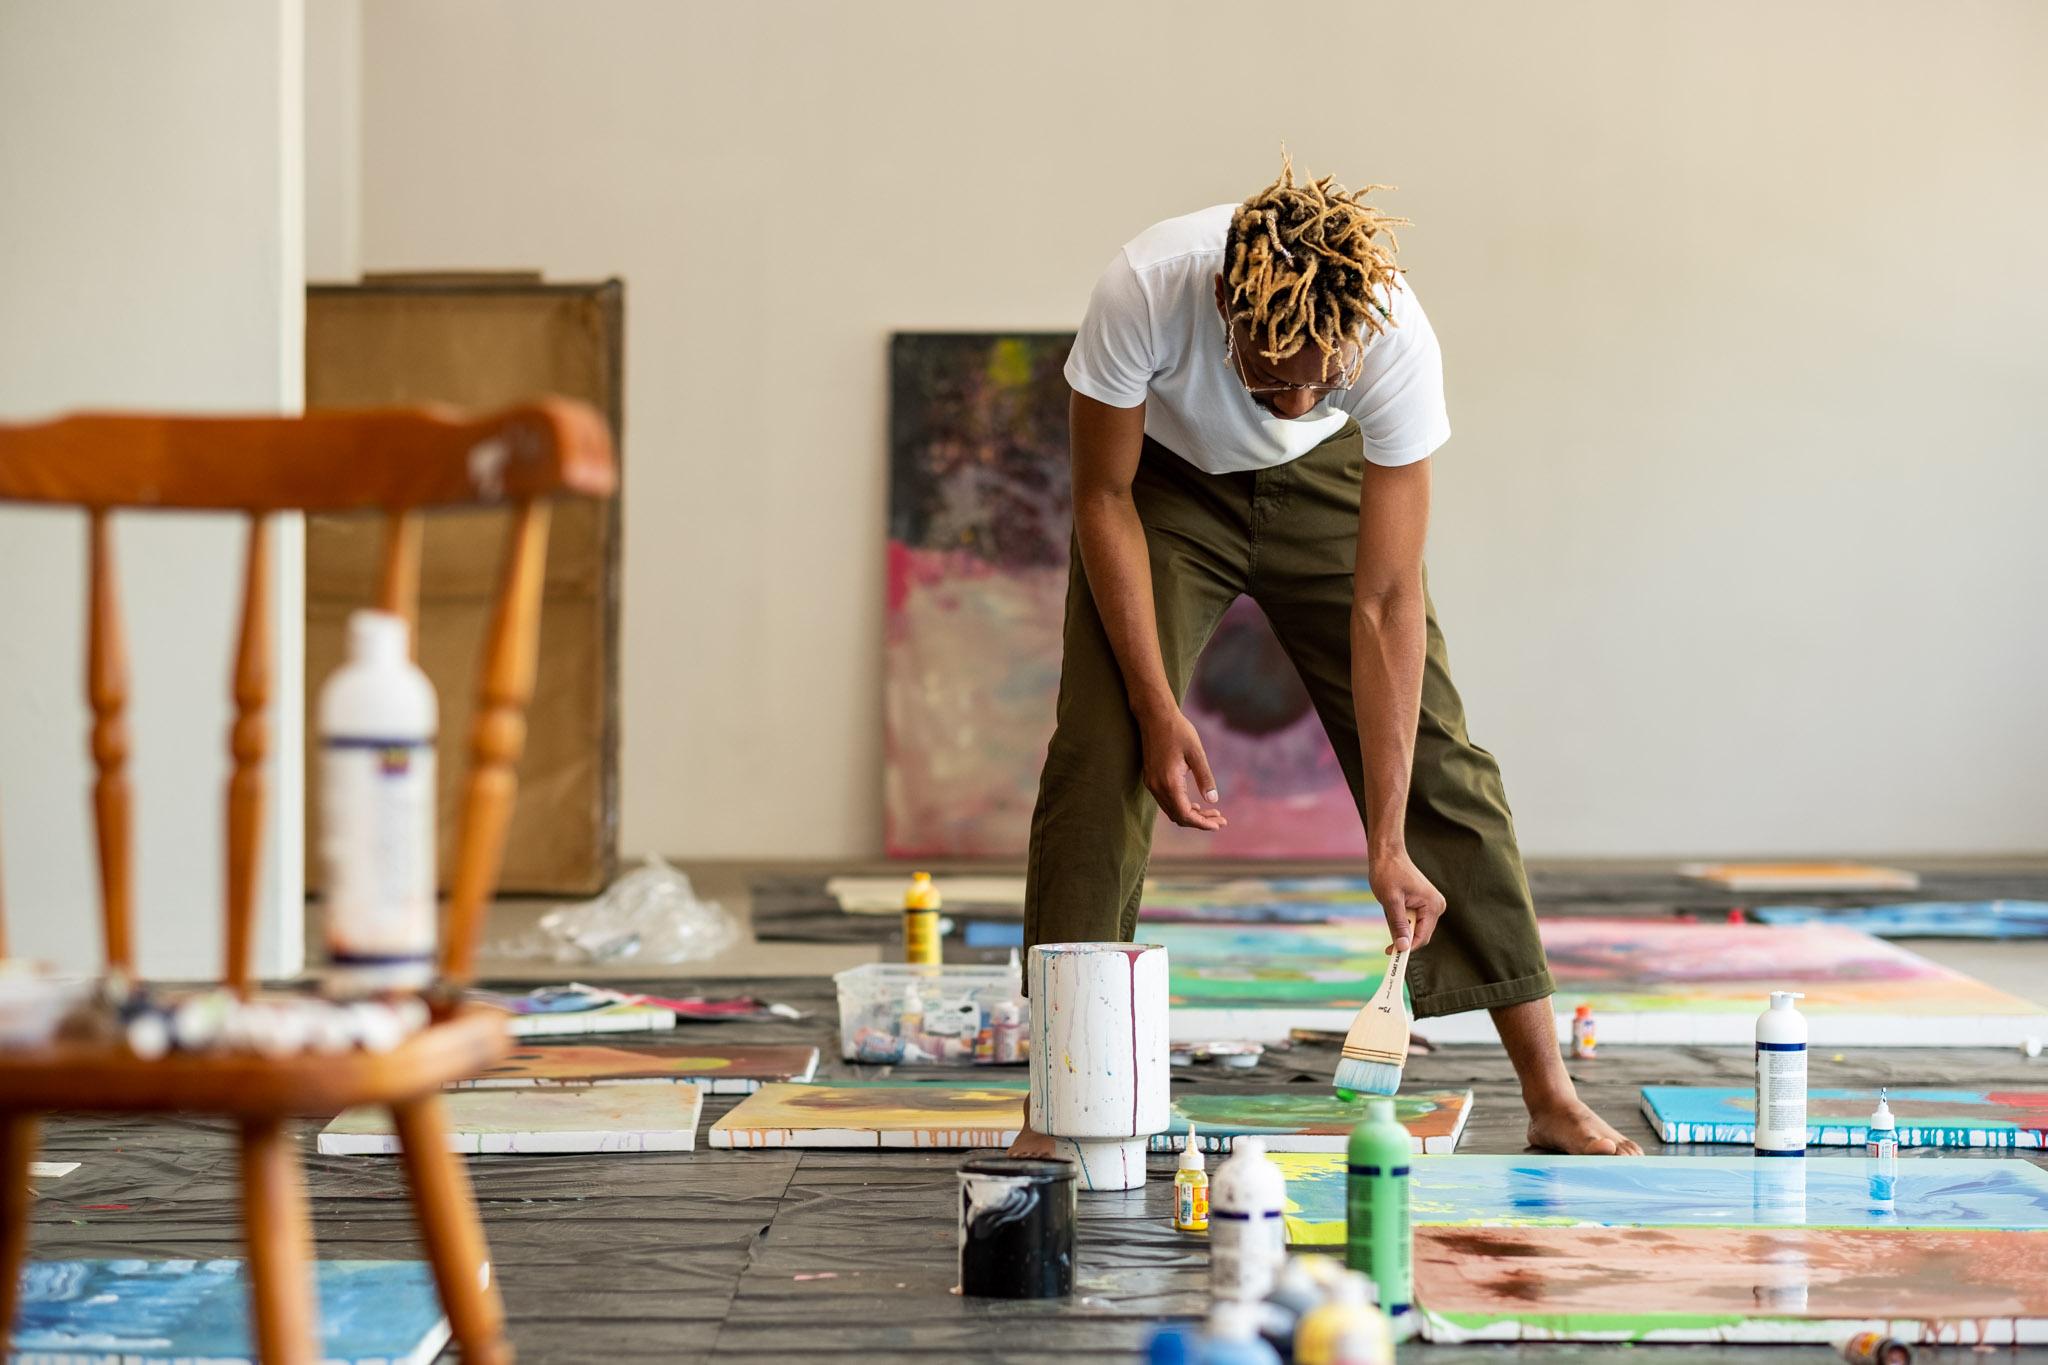 Banele Khoza working on his artwork taken by Bernard Brand